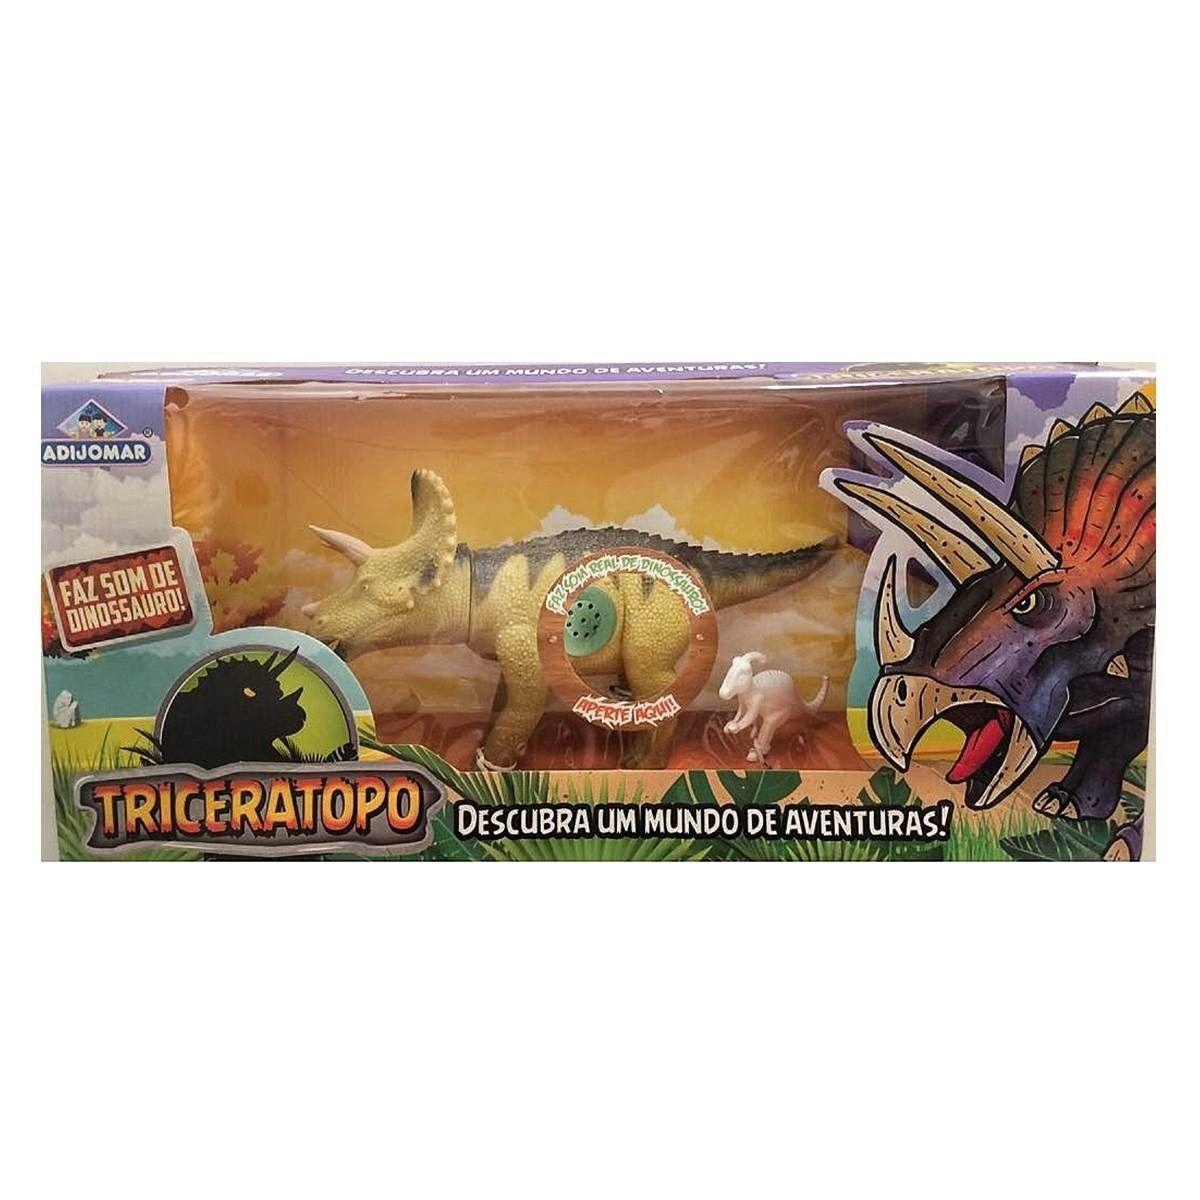 ... Dinossauro Triceratopo Descubra Um Mundo de Aventuras - Adijomar -  Descalshop ... d7f879f6636aa